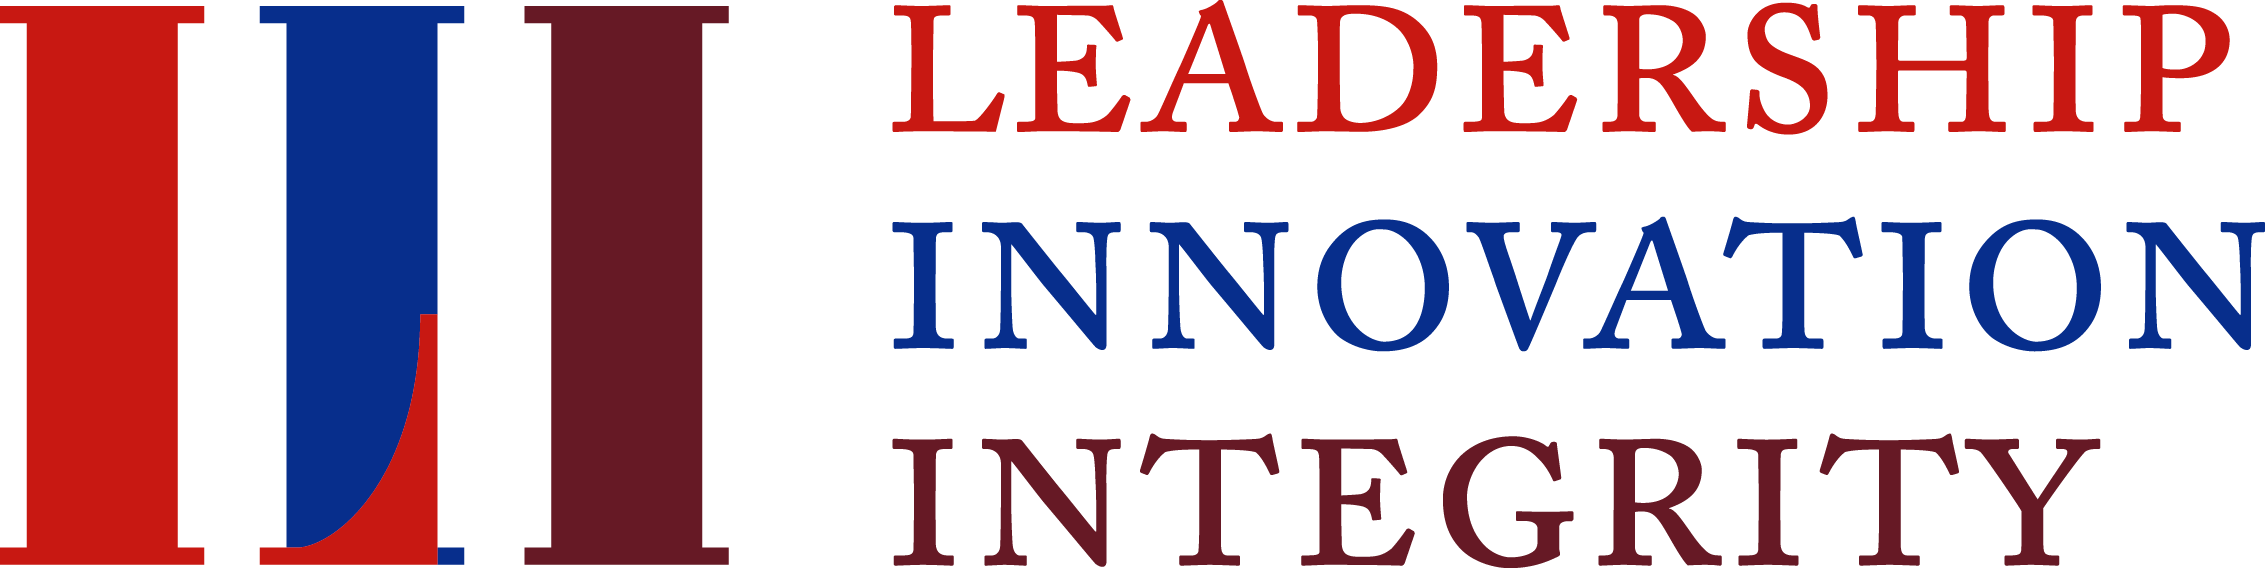 20181113LII_logo_key.png